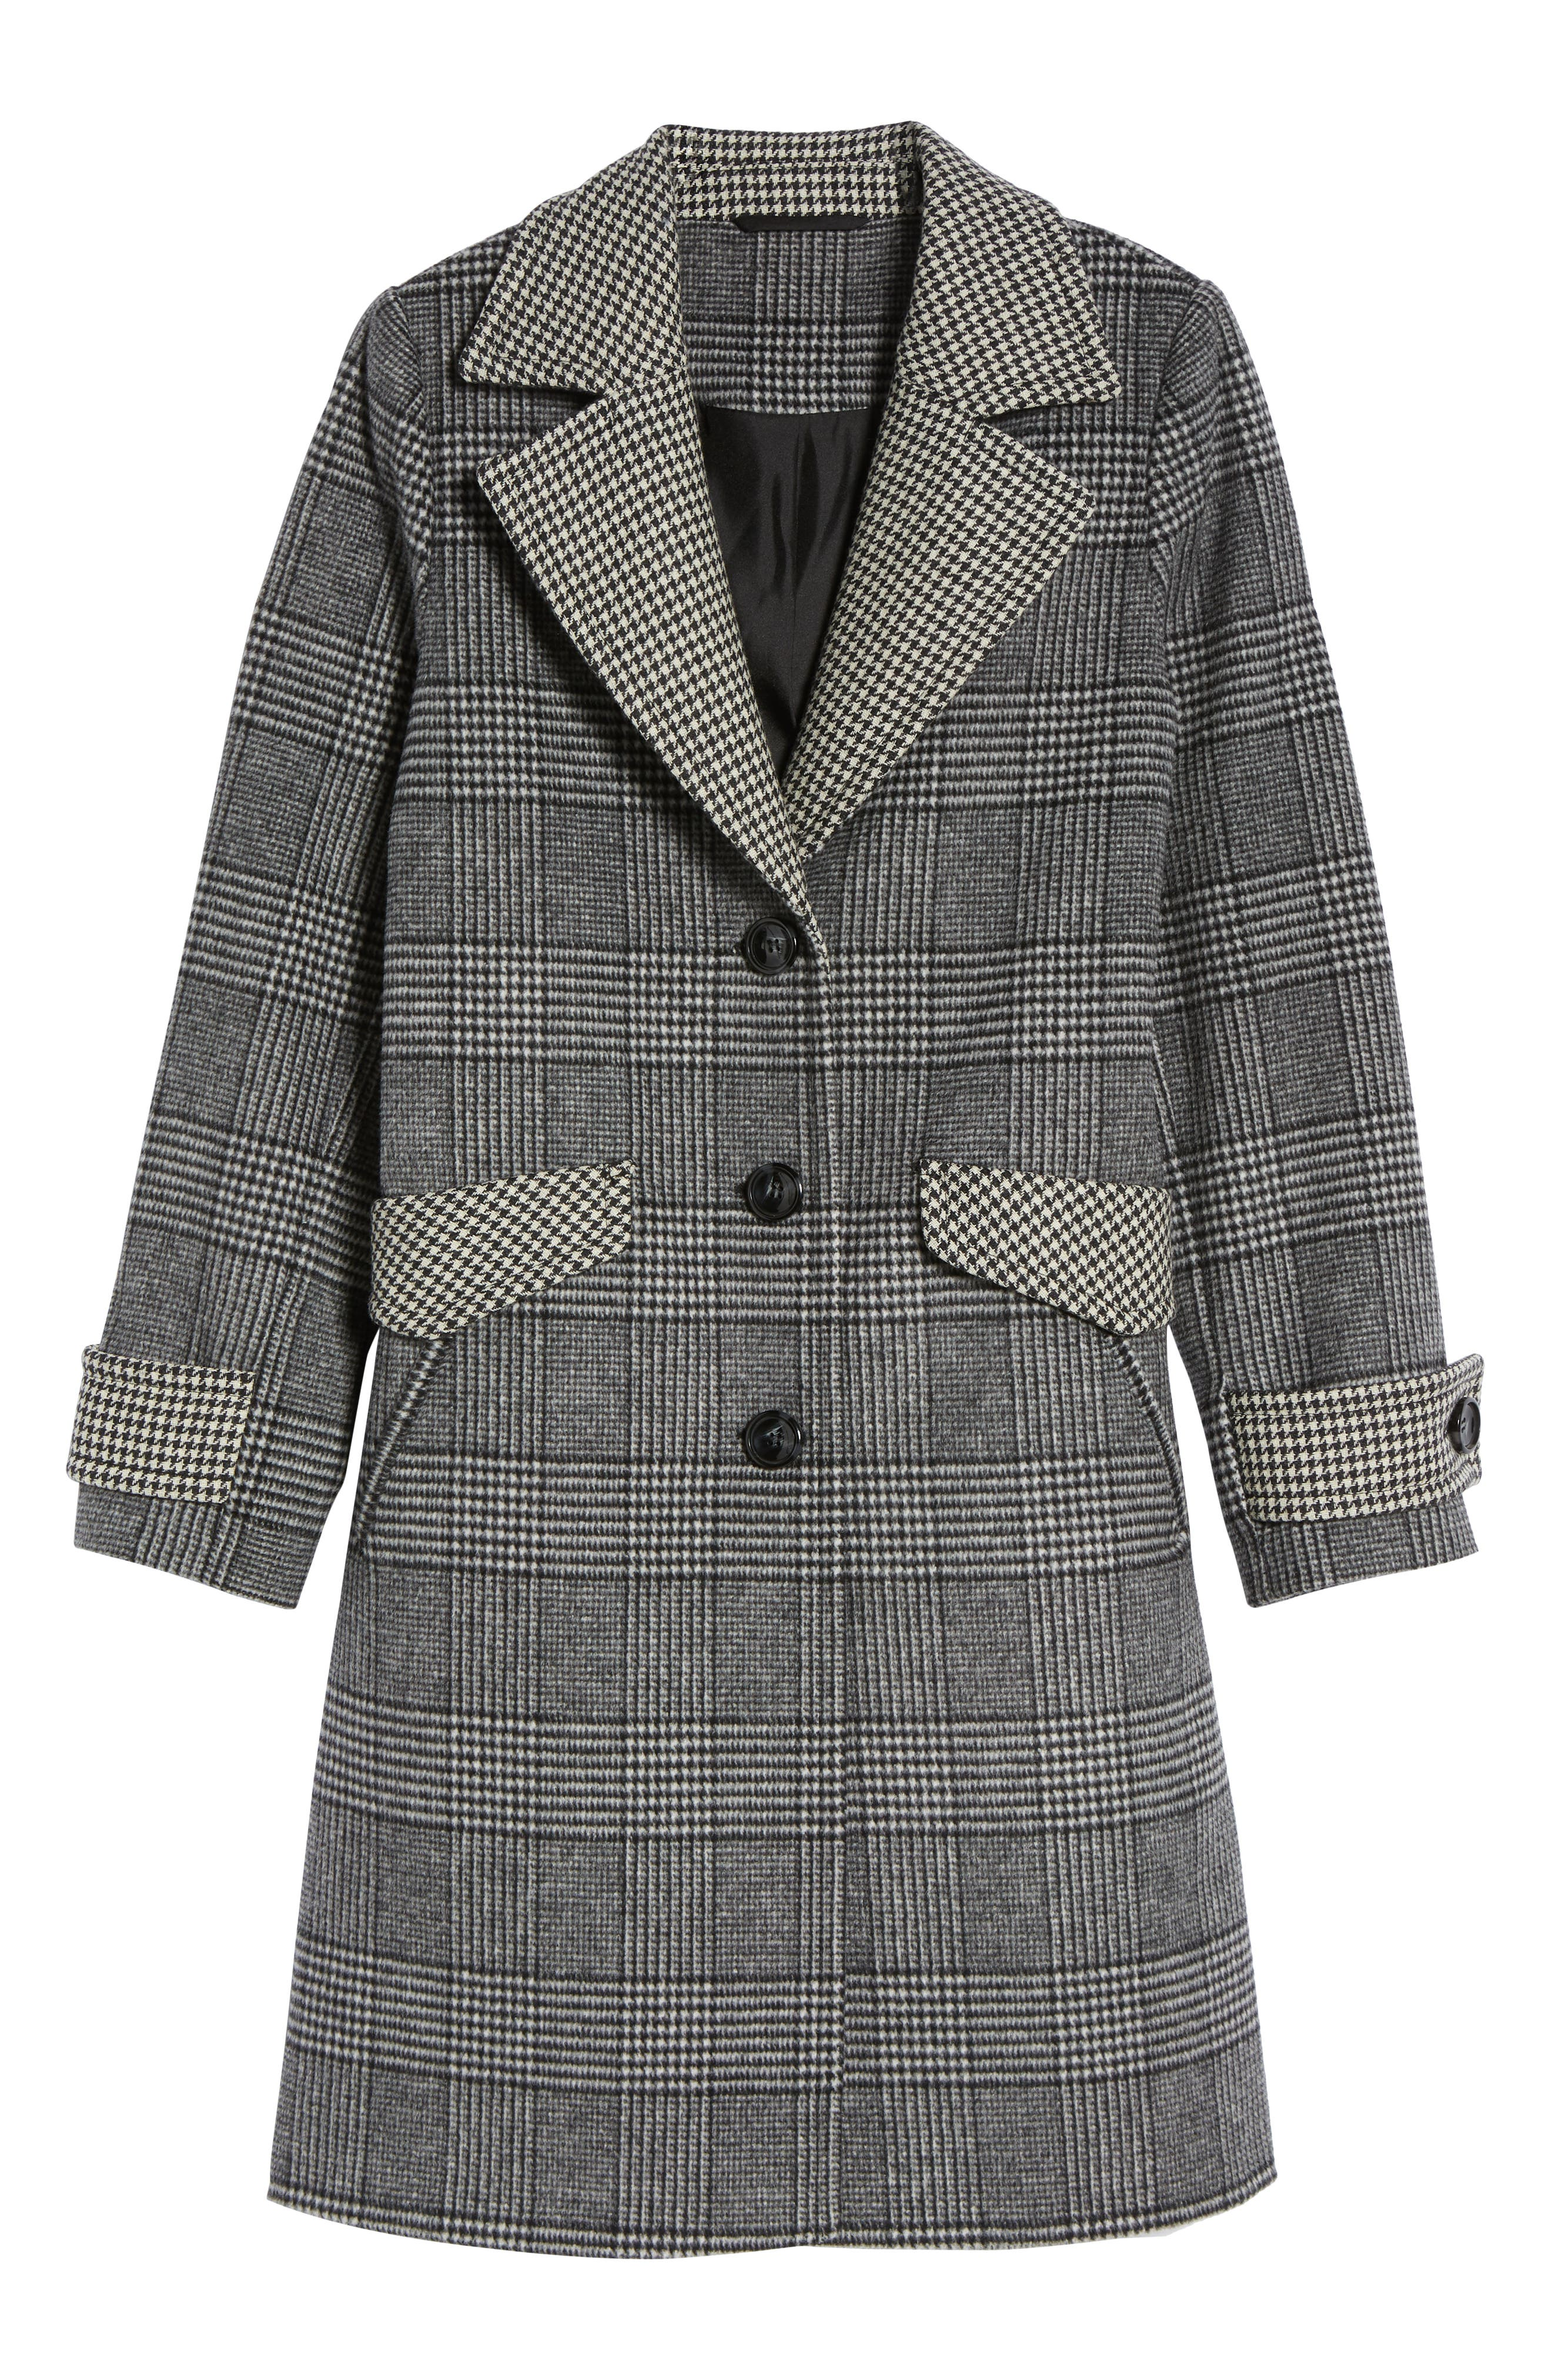 Plaid Mix Wool Coat,                             Alternate thumbnail 6, color,                             001